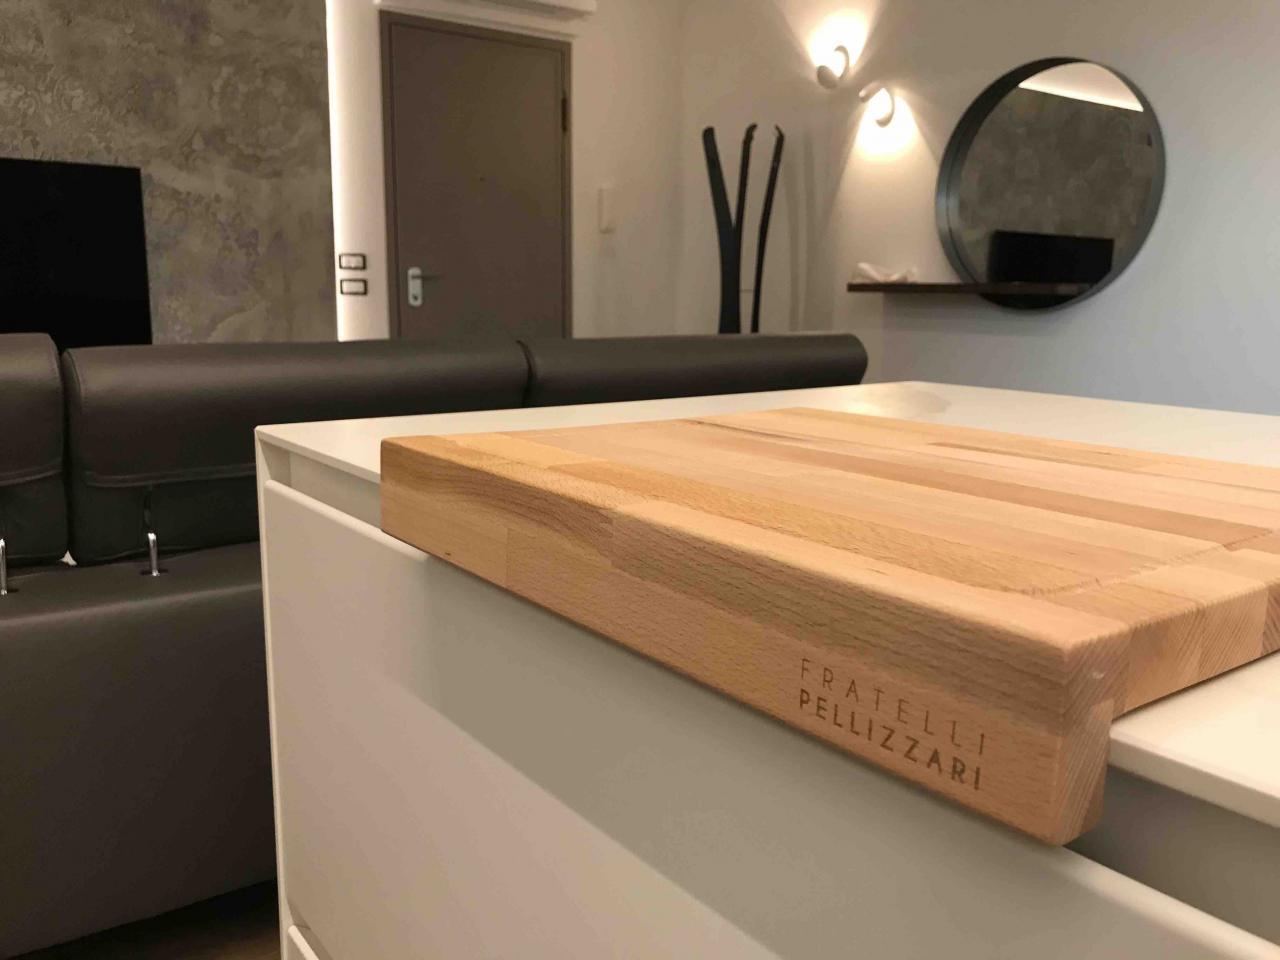 Piani Per Cucine In Muratura la cucina moderna: consigli e suggerimenti | fratelli pellizzari